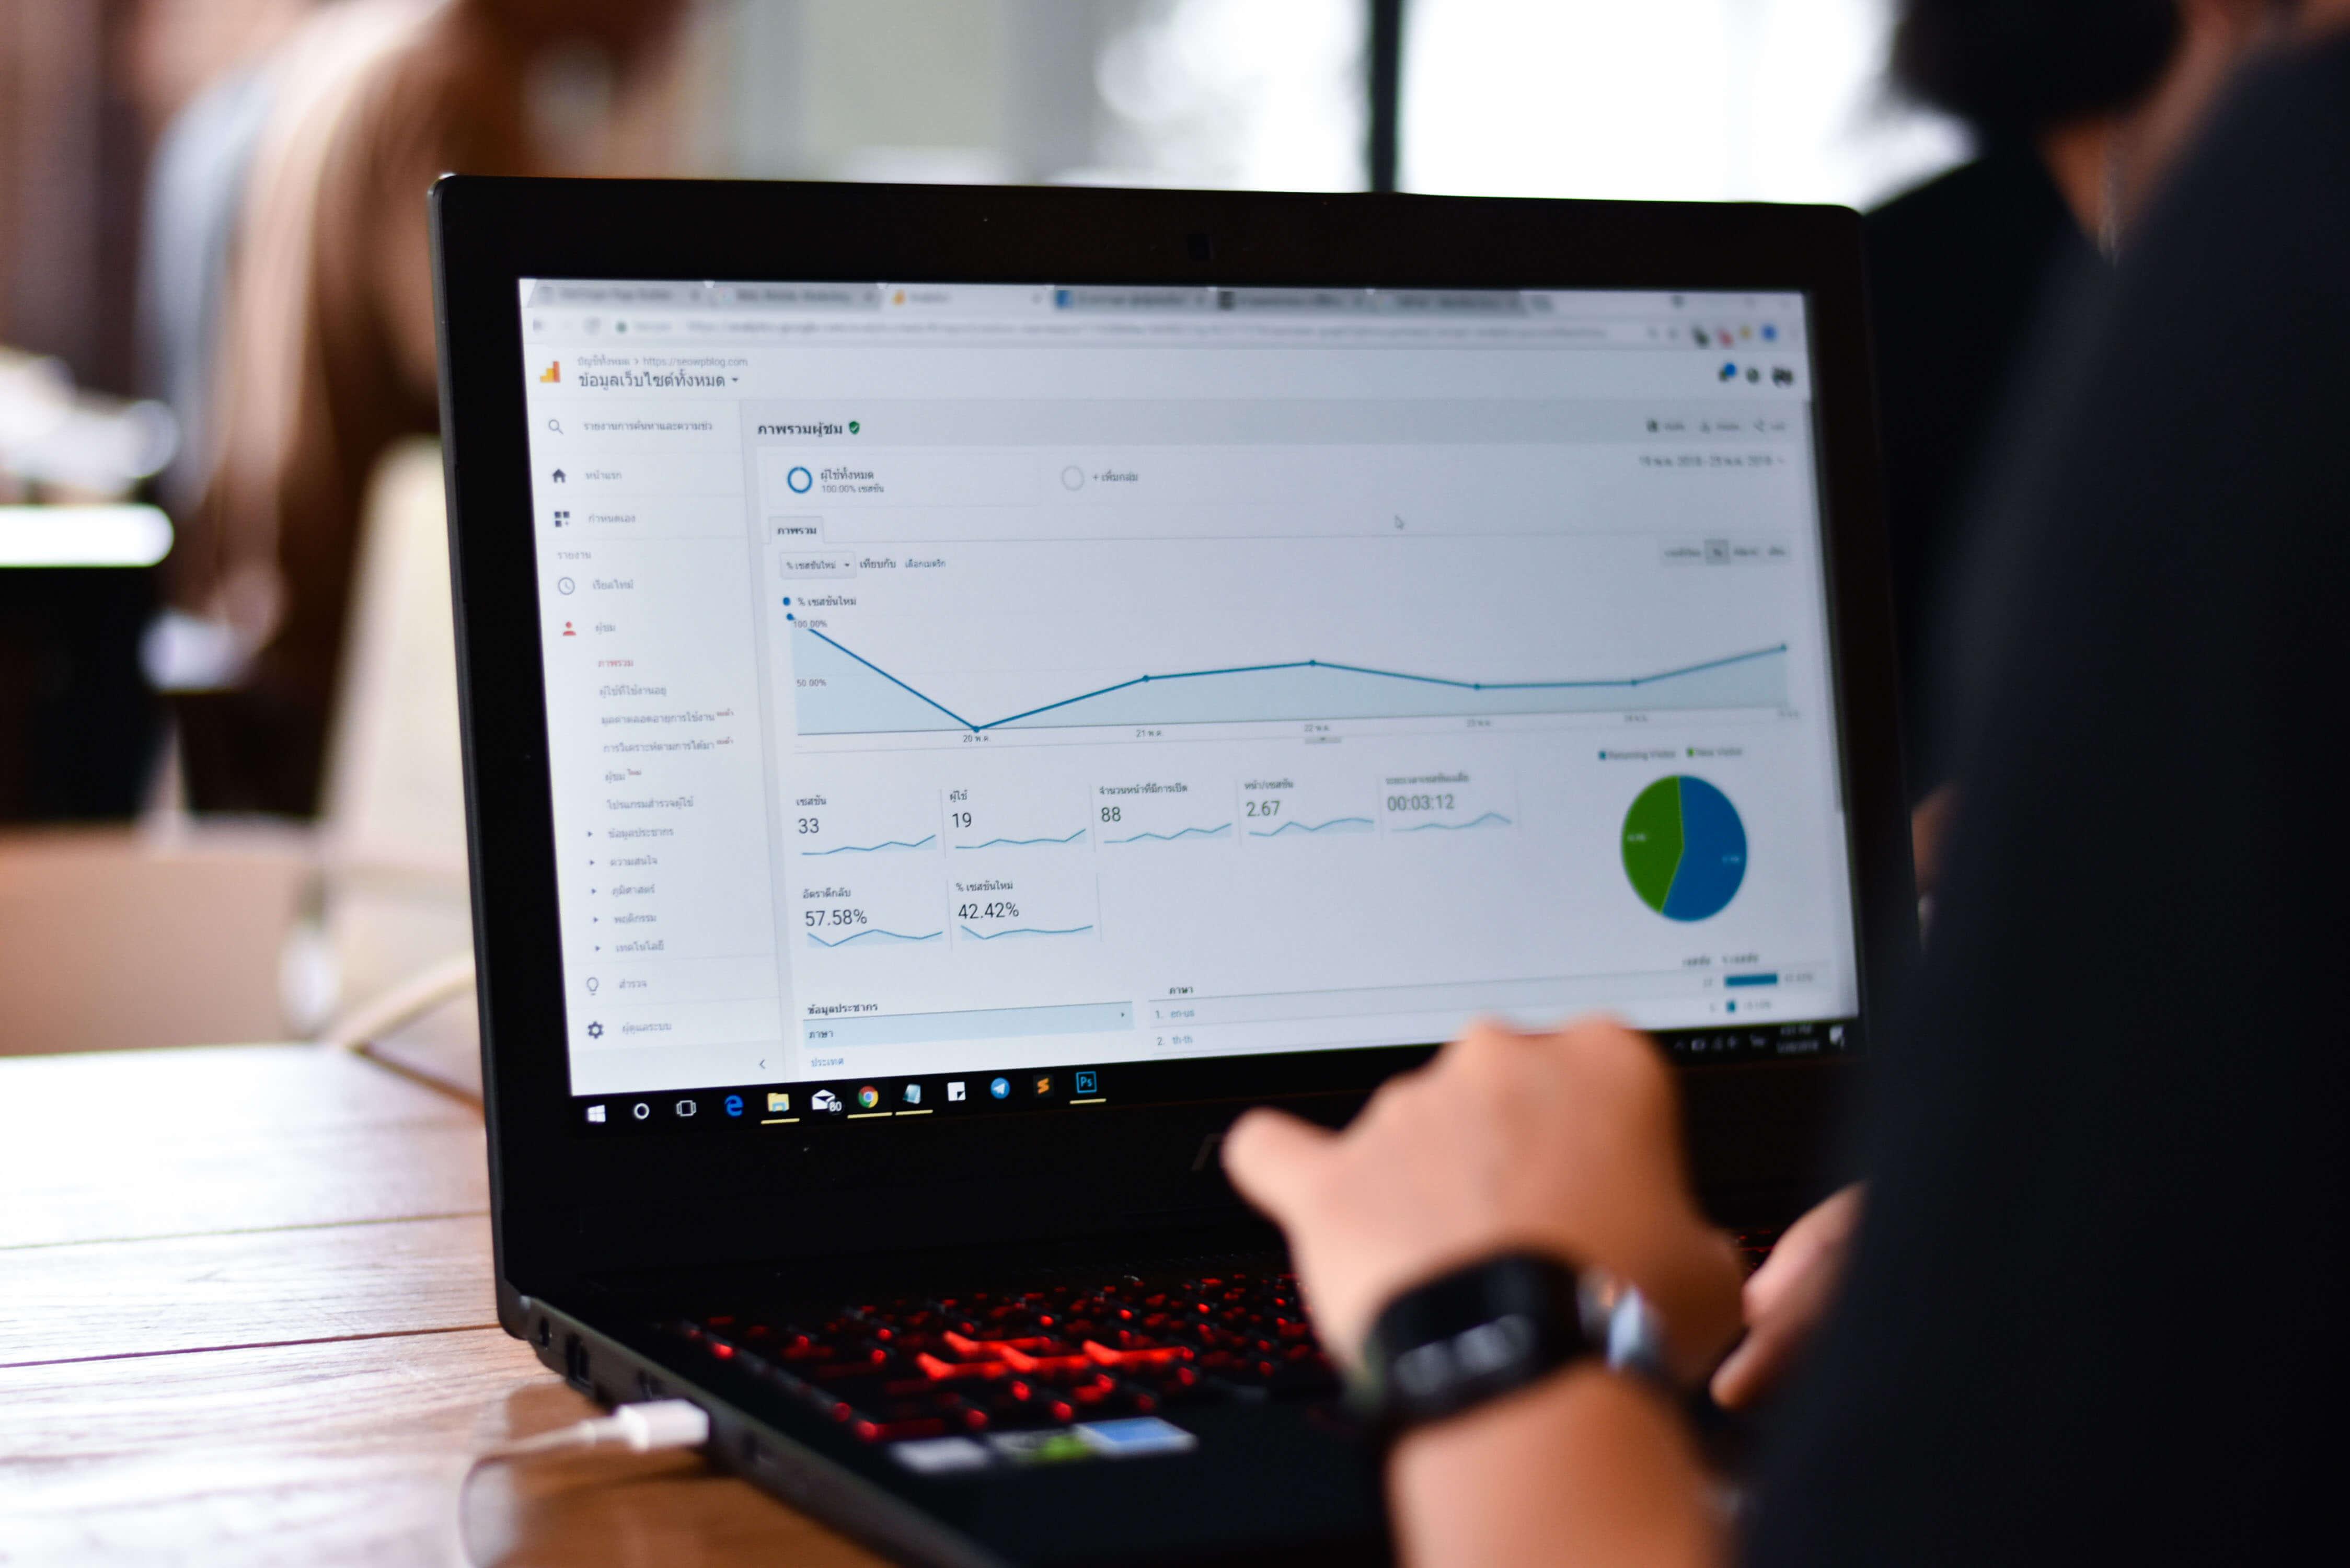 laptop showing google analytics on it.